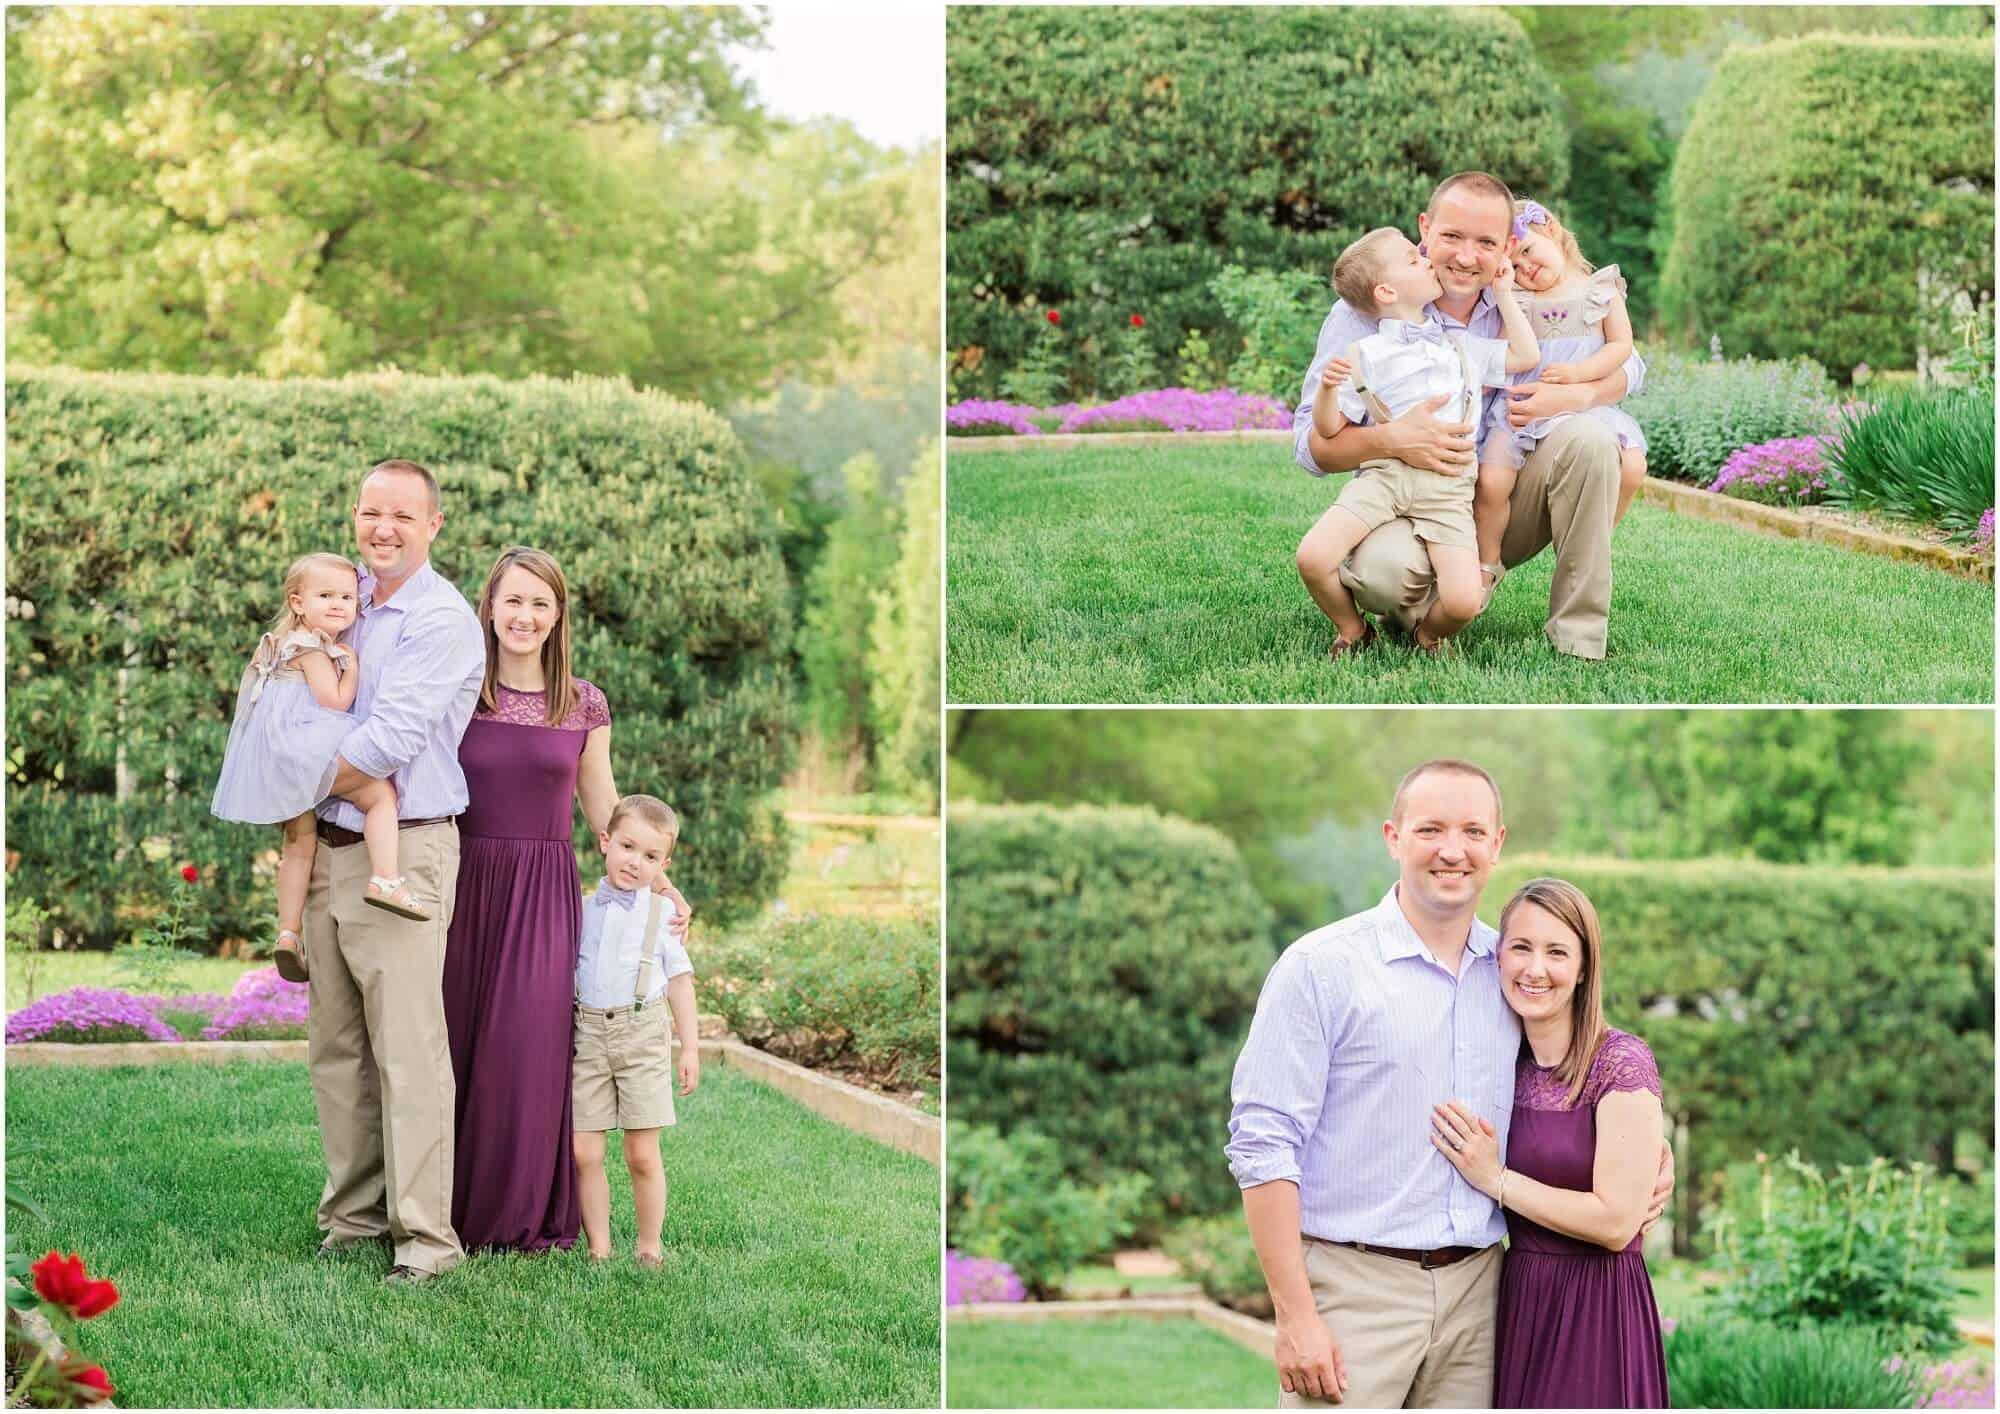 family photography kingwood center spring garden mansfield ohio photographer